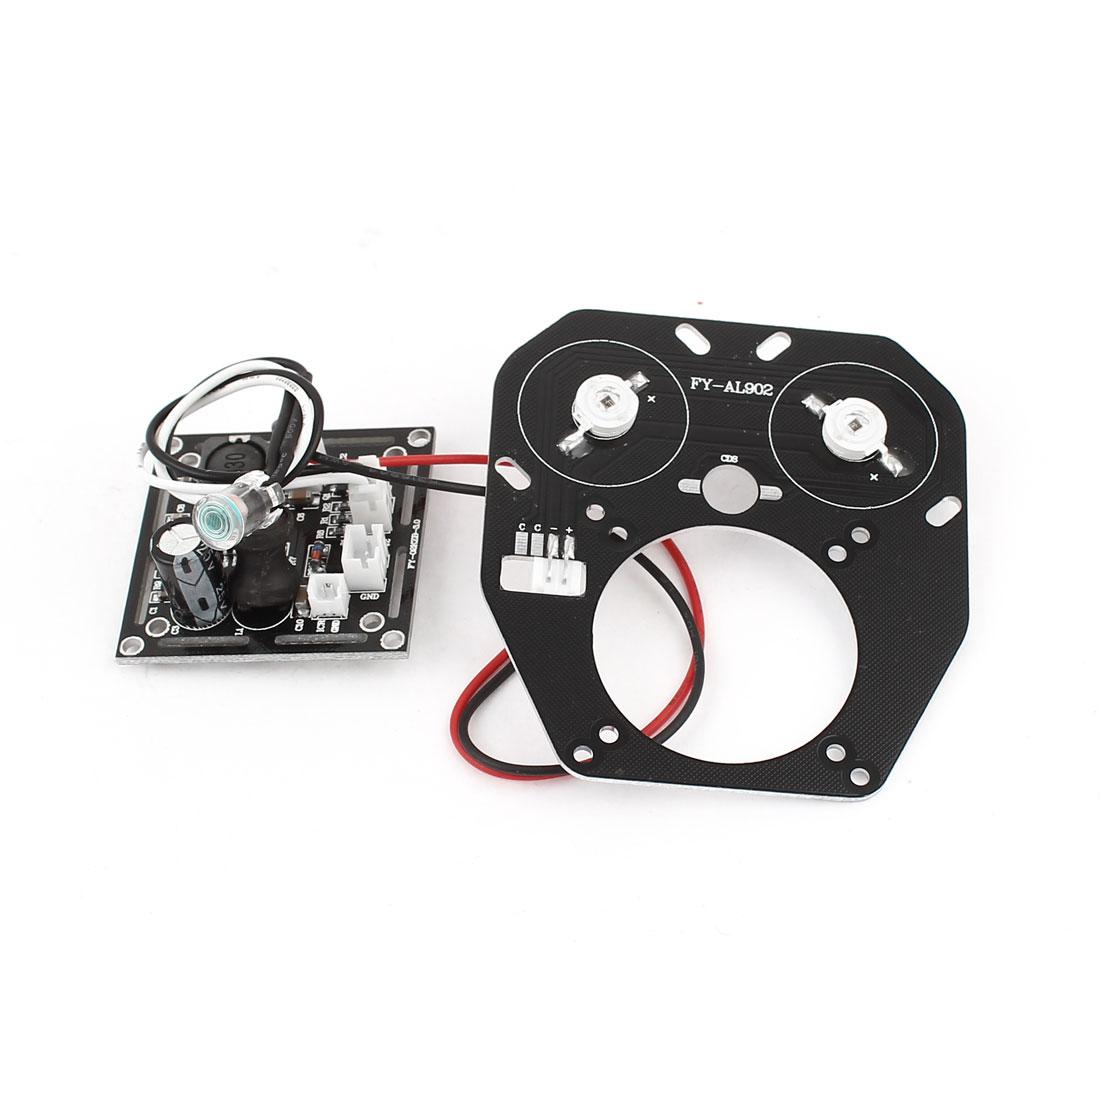 42mil Double Array LED IR Bulb Board Plate for CCTV Security Surveillance Camera